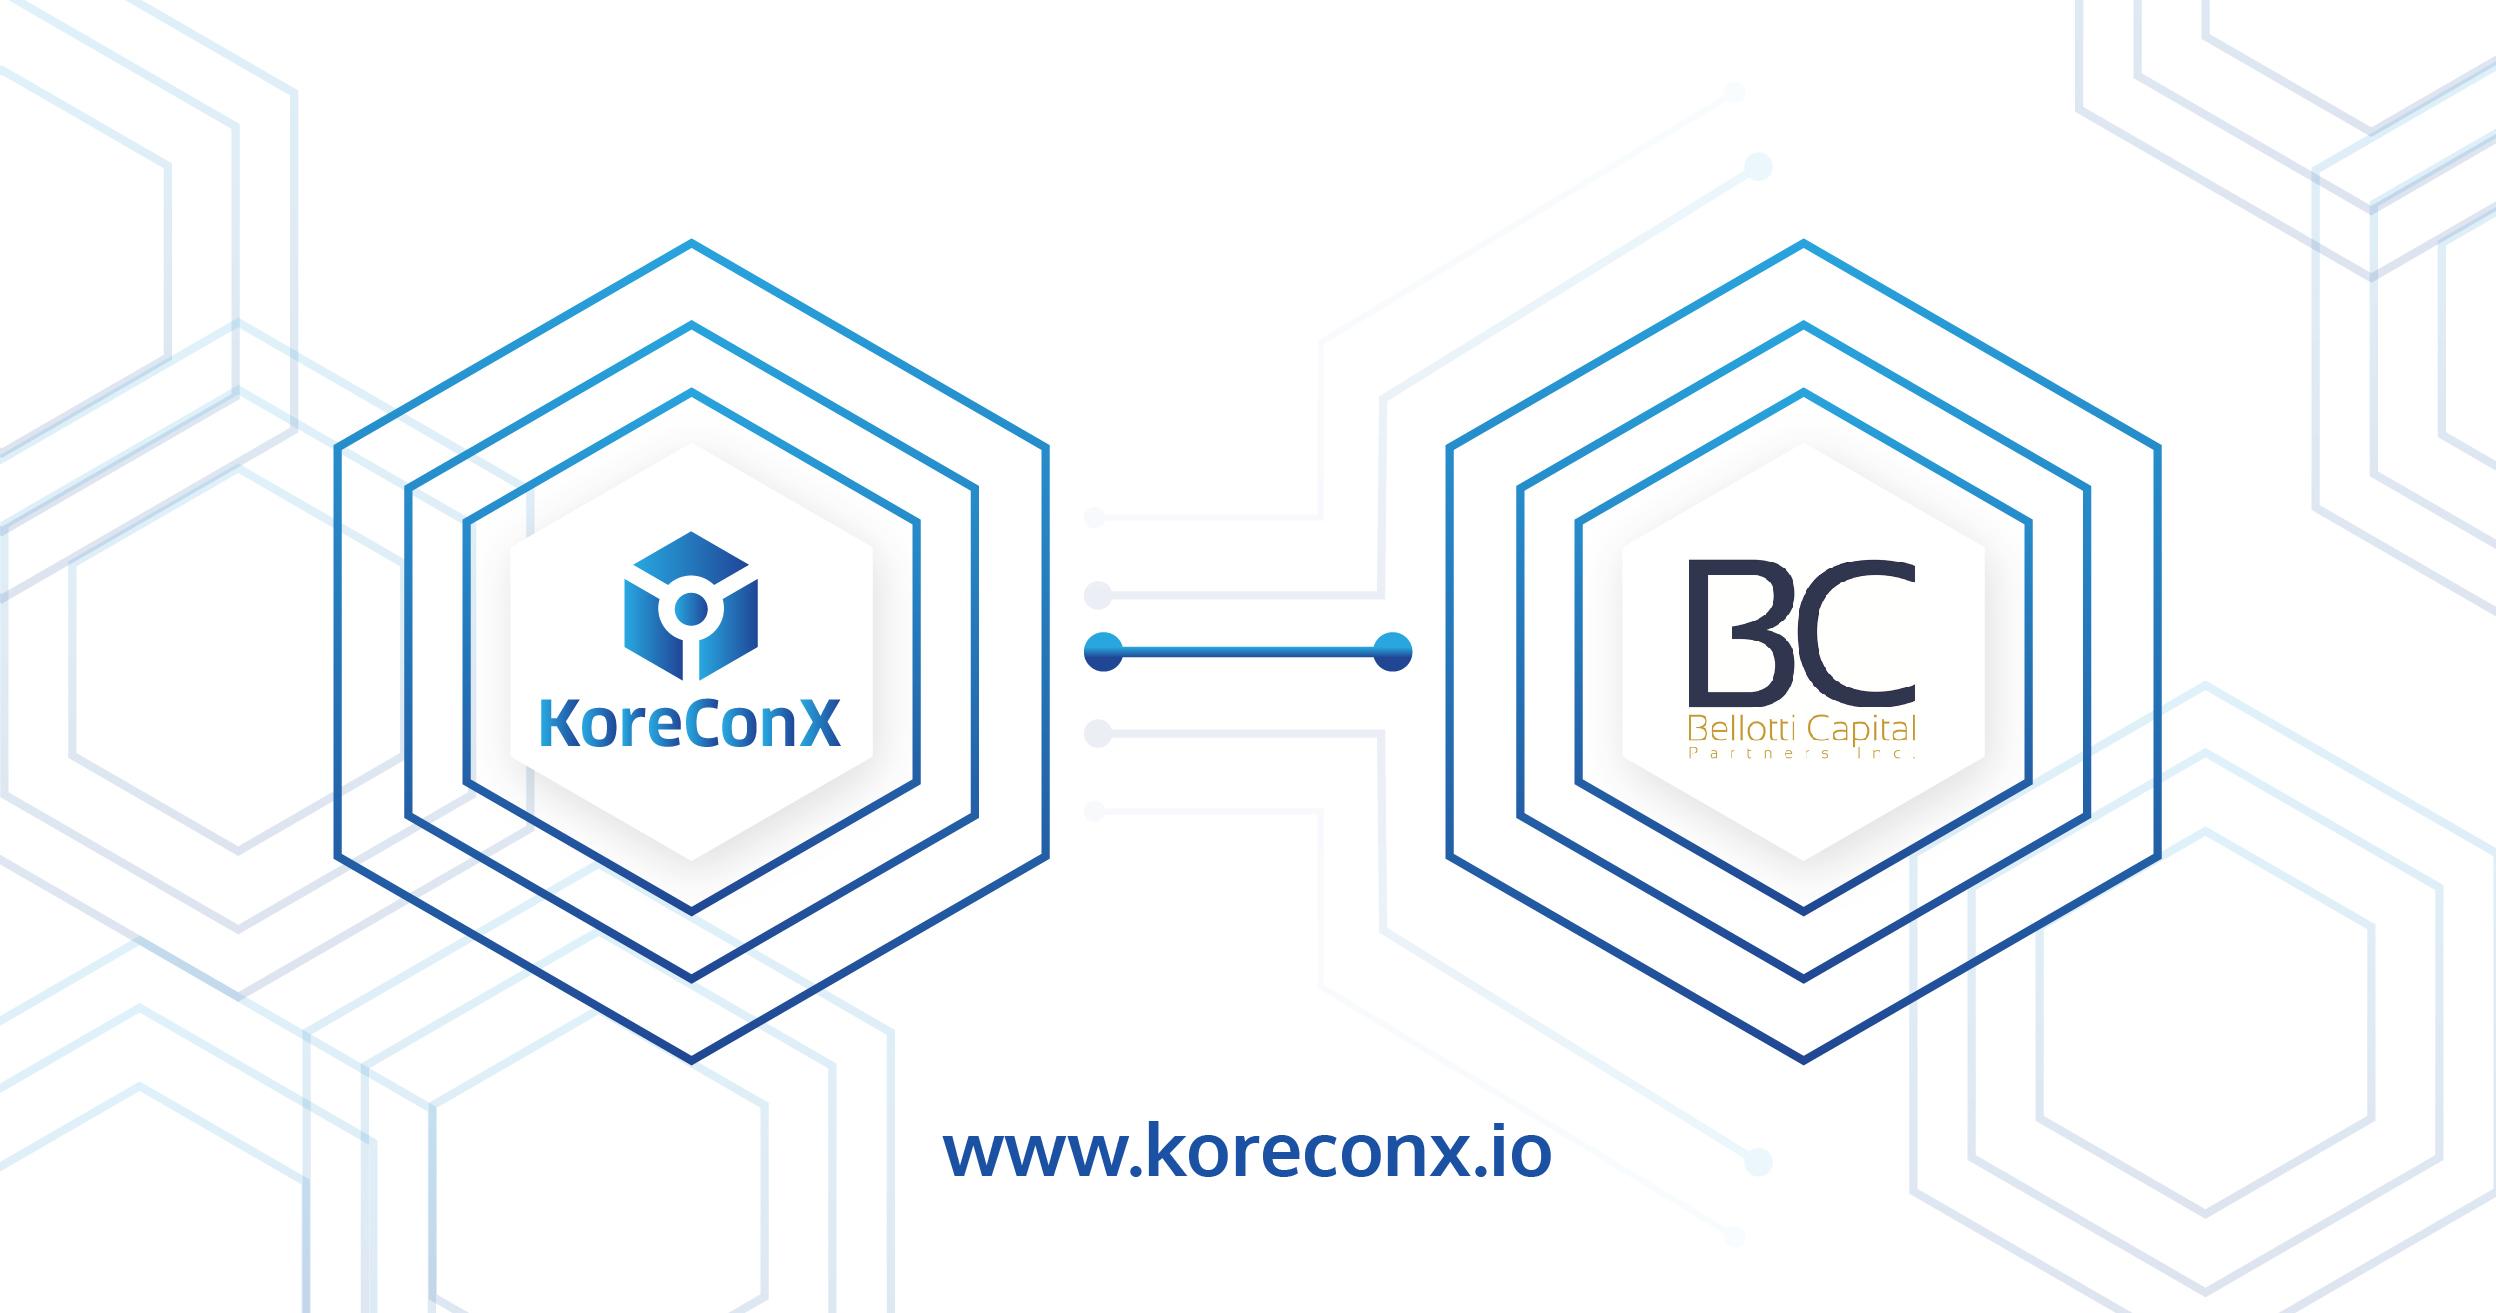 KoreConX BC Capital